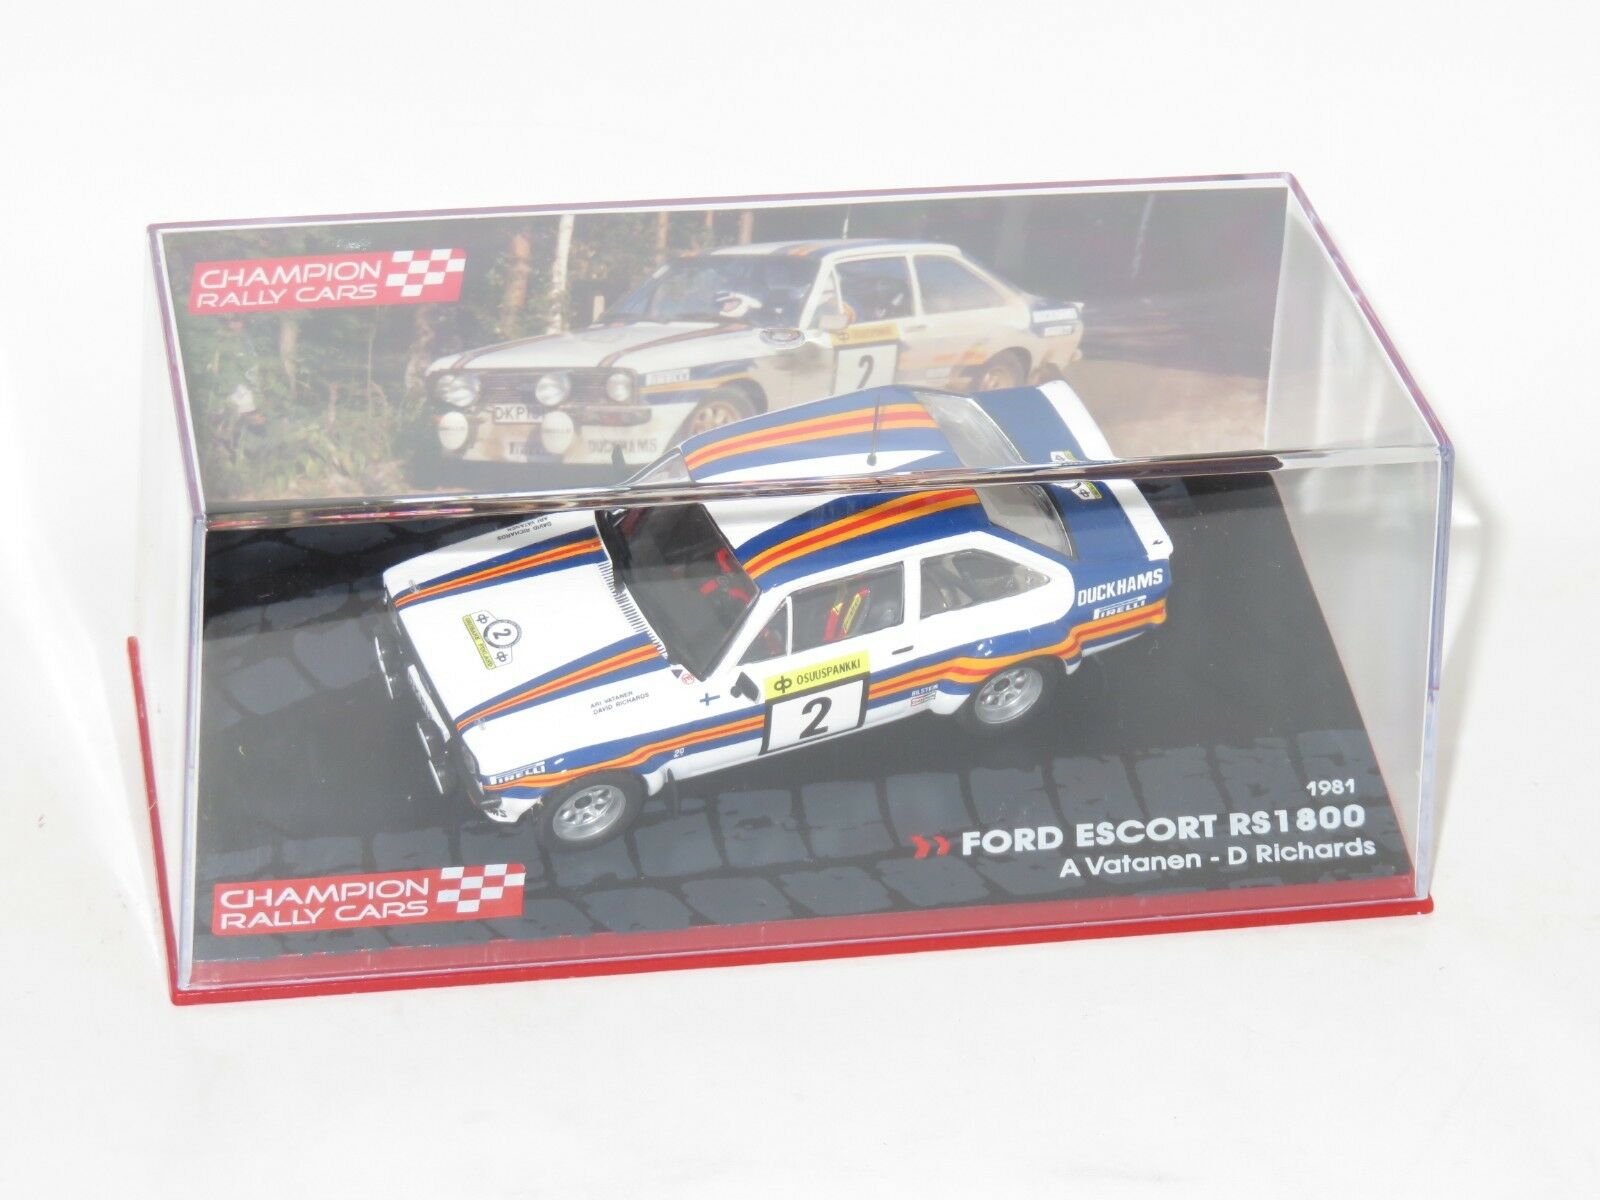 1 43 Ford Escort Mk2 RS1800  Rally 1000 Lakes Finland 1981  A.Vatanen